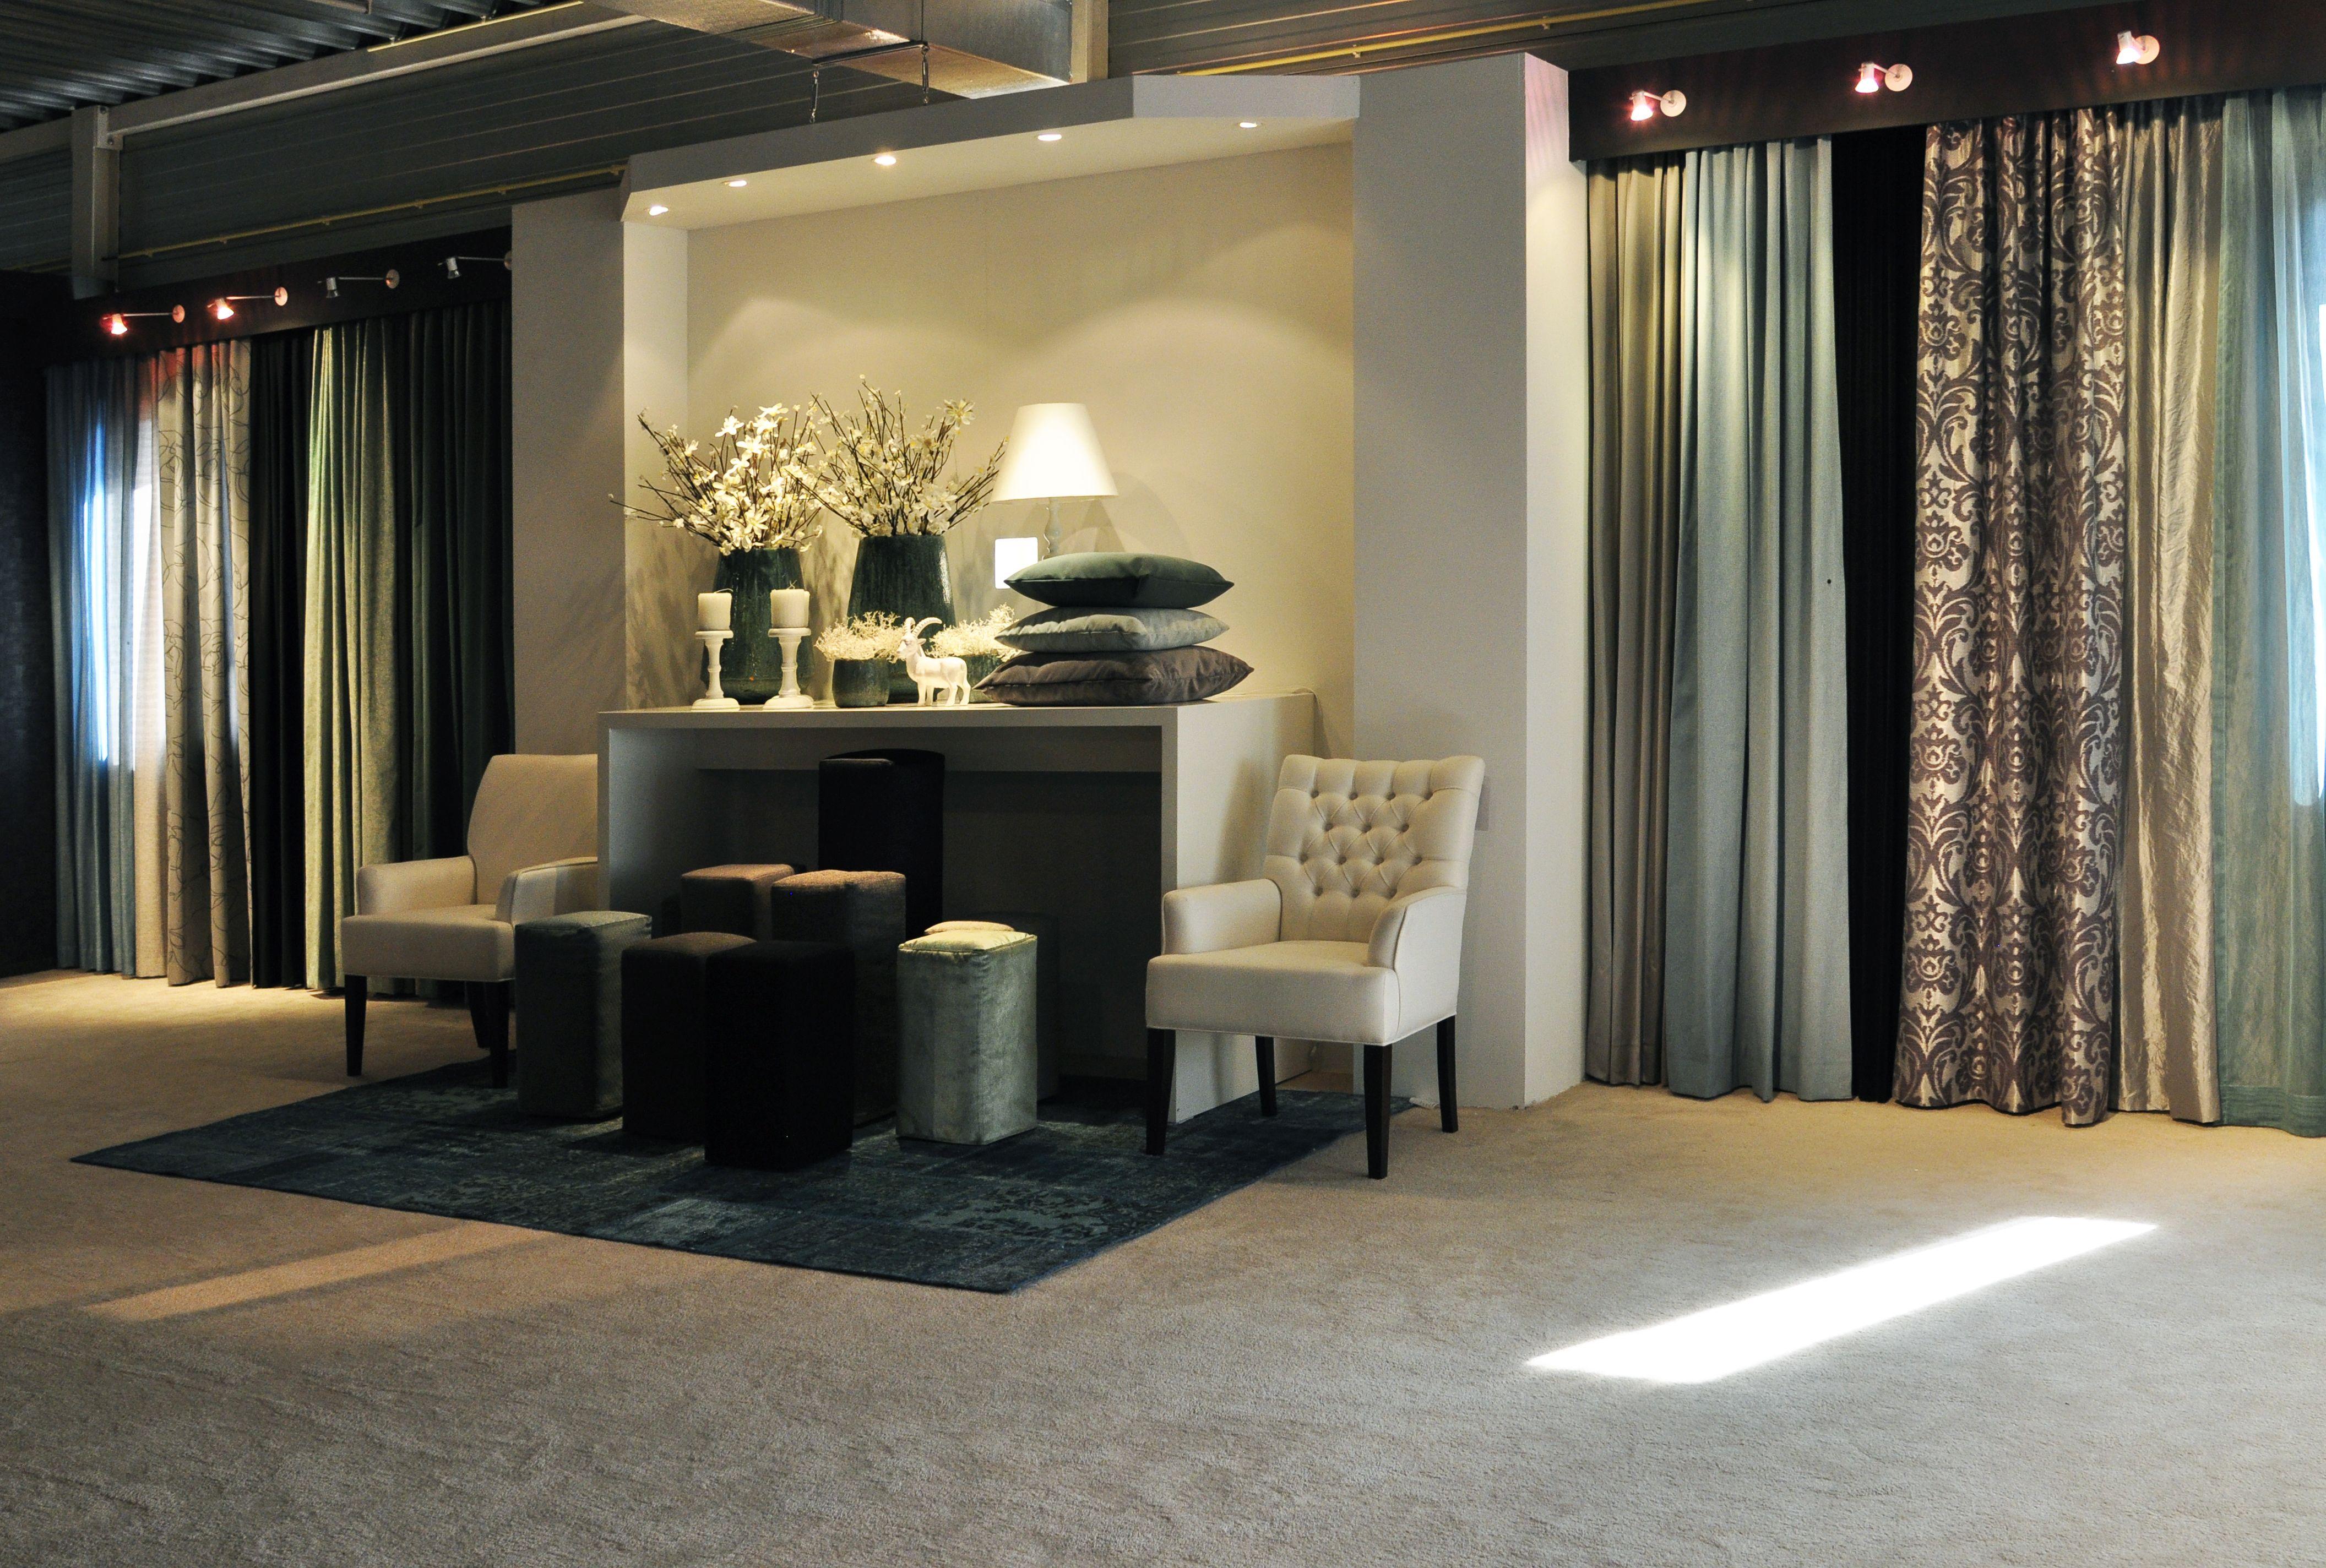 31 kobe interior design ideas